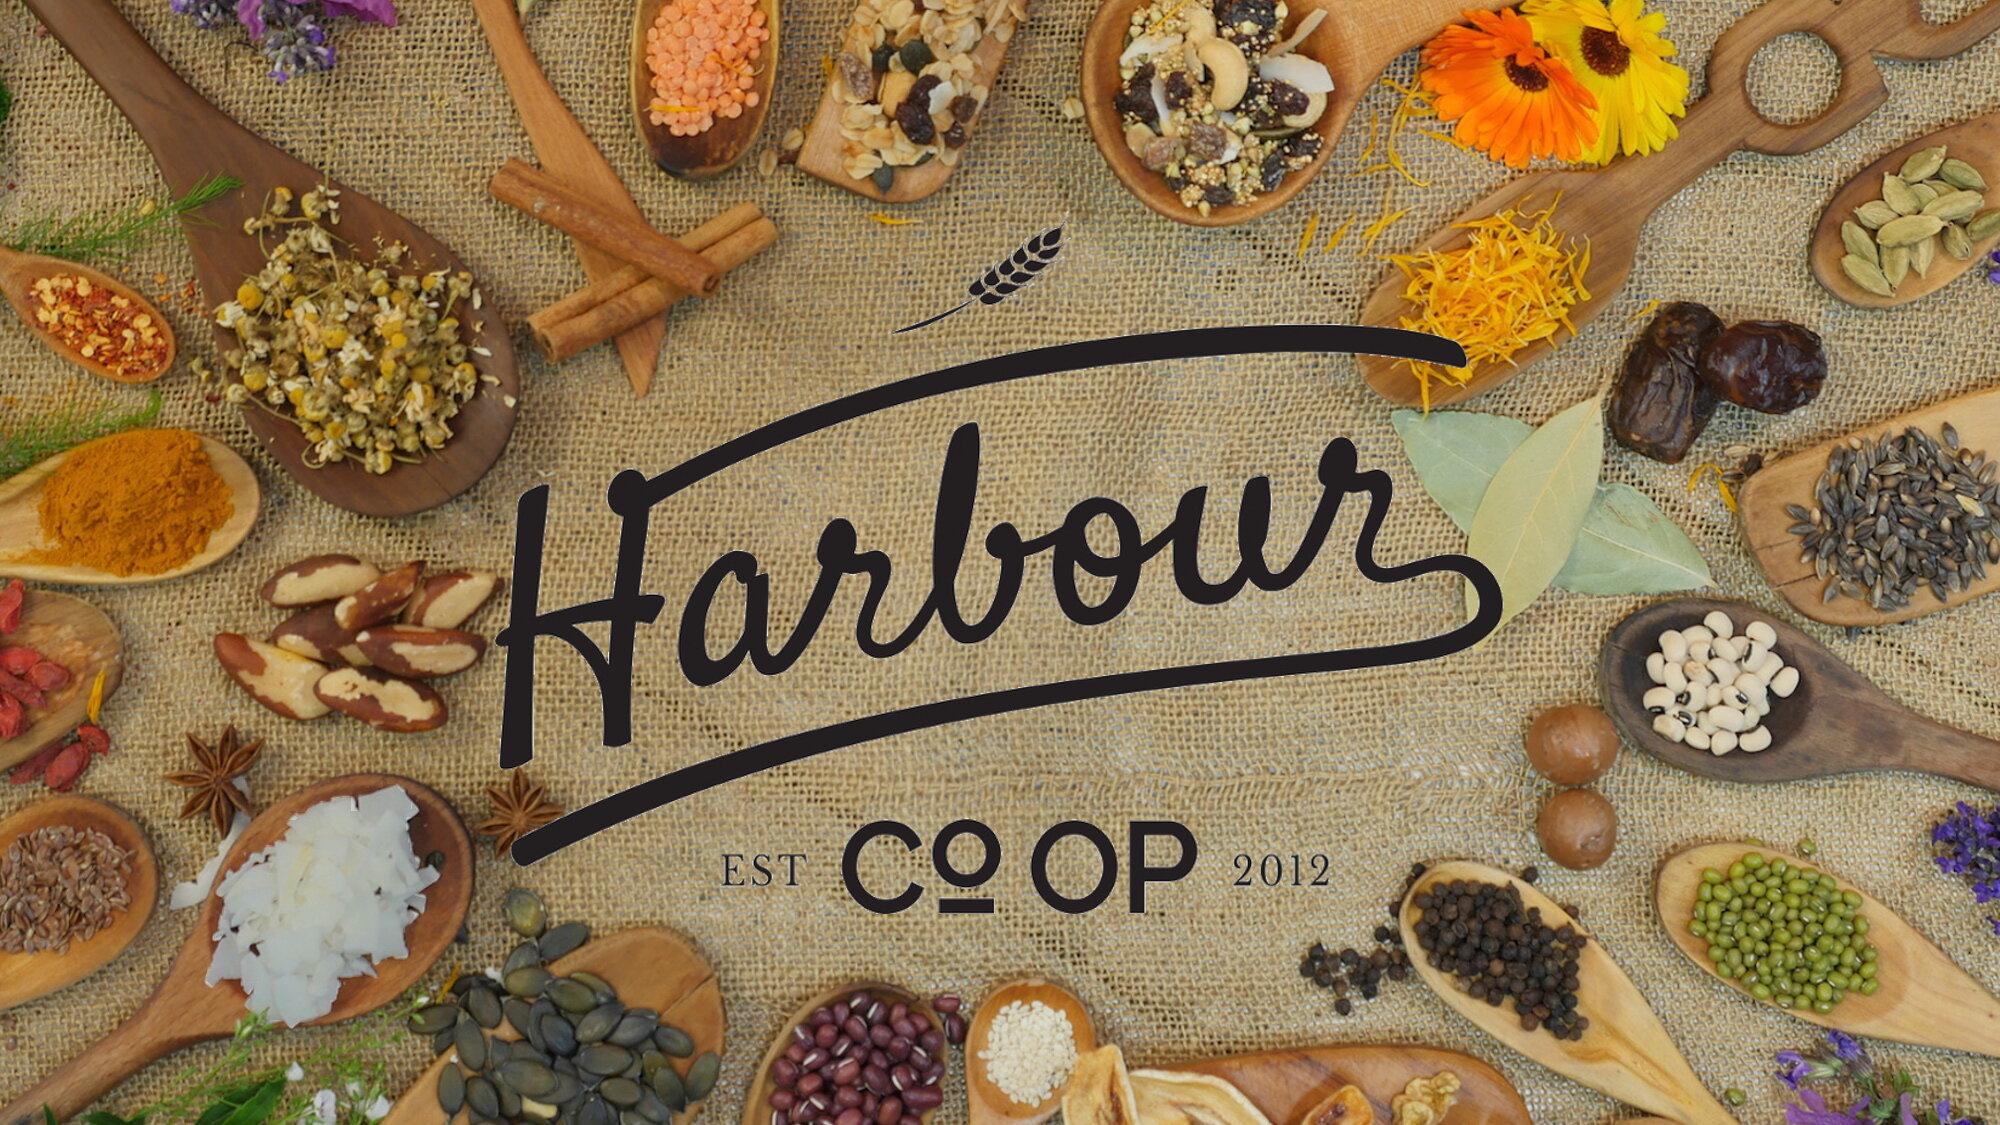 Harbour Coop Logo.jpg